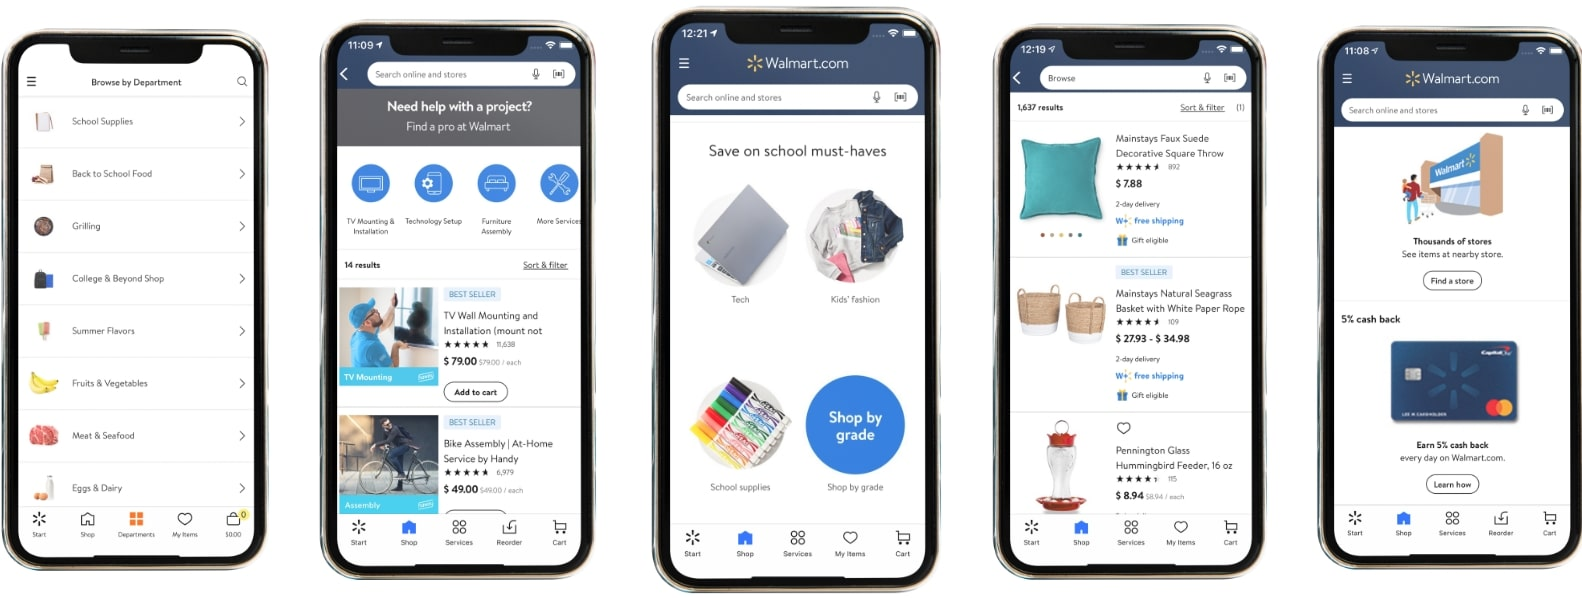 screenshots of the walmart mobile app